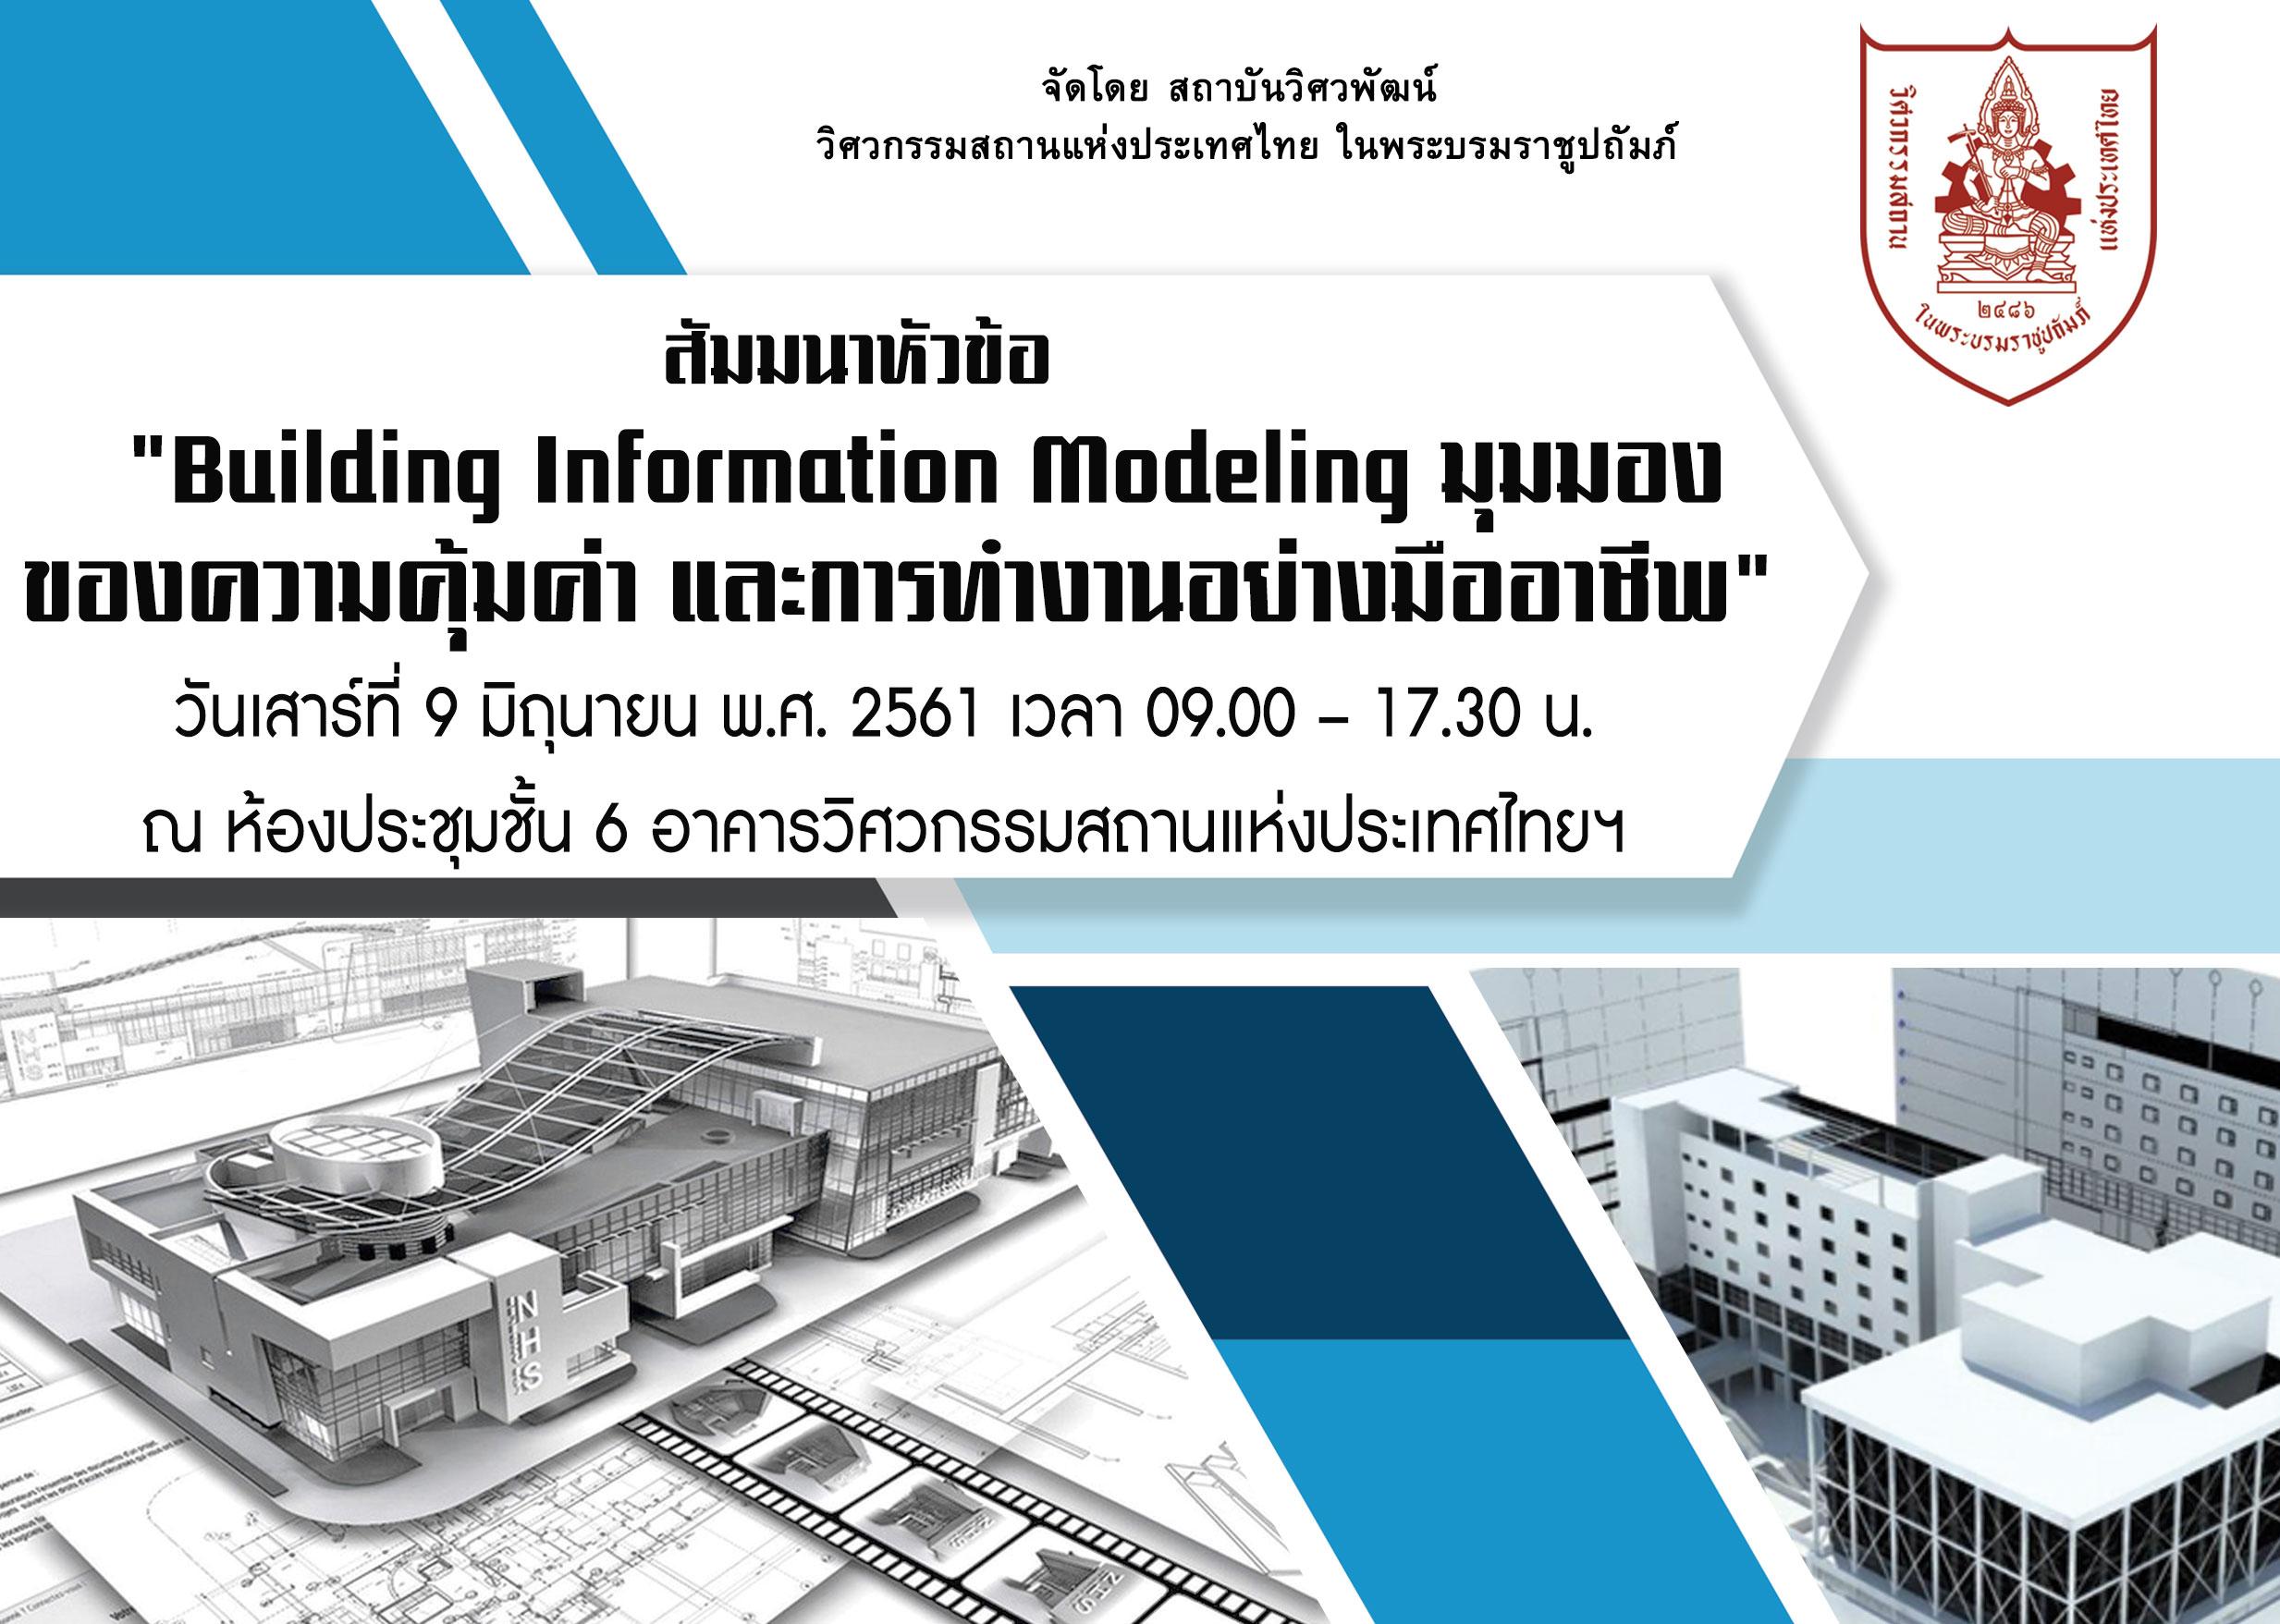 "09-06-61 ""Building Information Modeling มุมมองของความคุ้มค่า และการทำงานอย่างมืออาชีพ"""